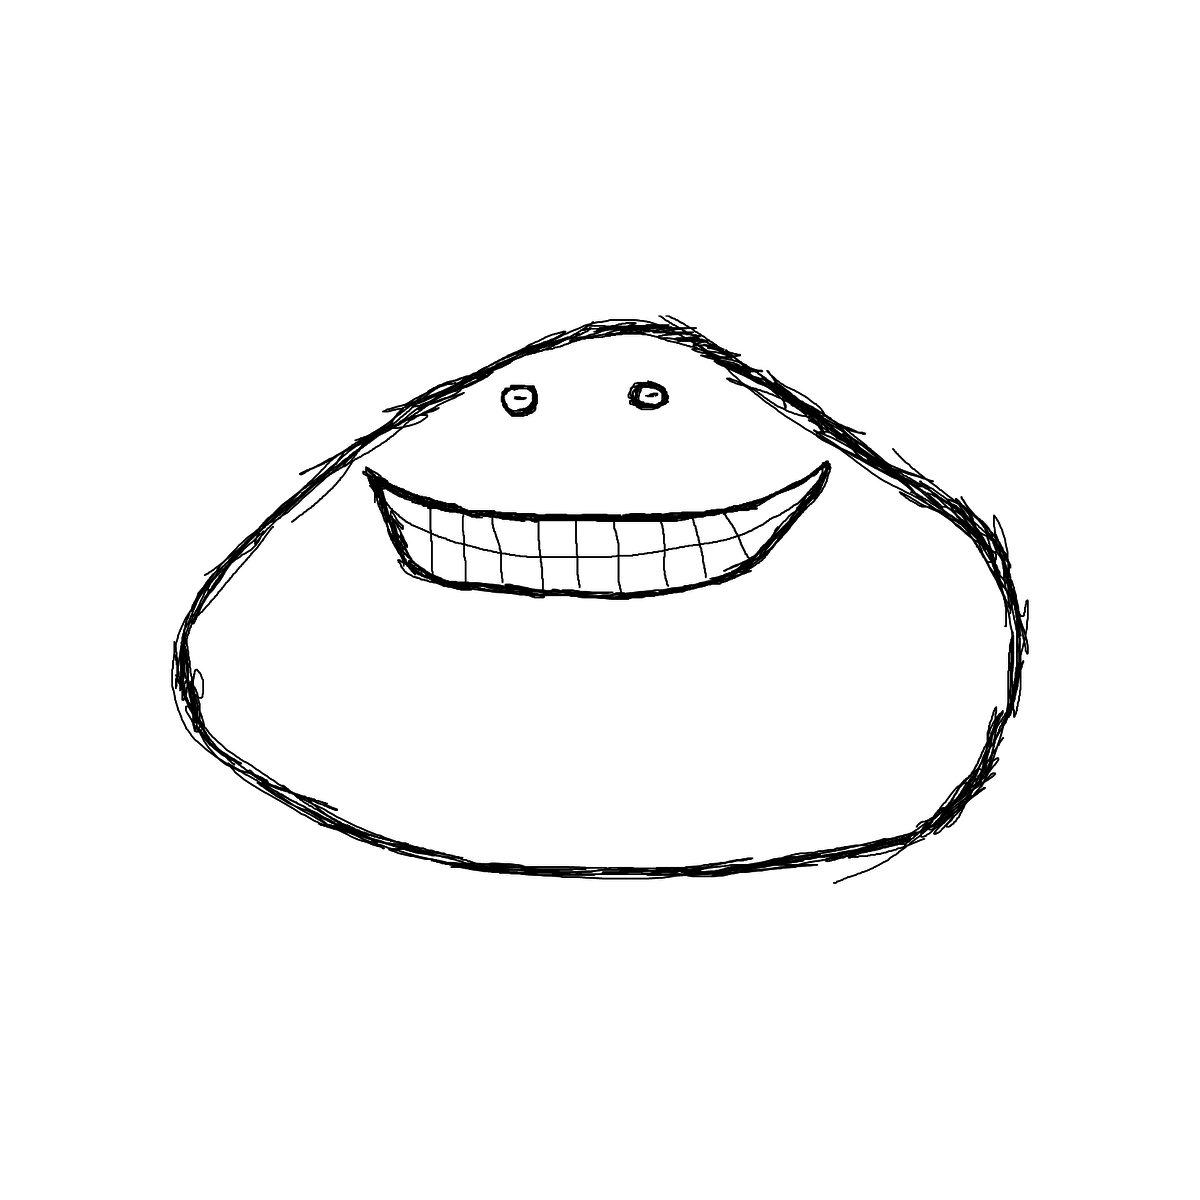 BAAAM drawing#19212 lat:60.3900260925293000lng: 25.6670150756835940